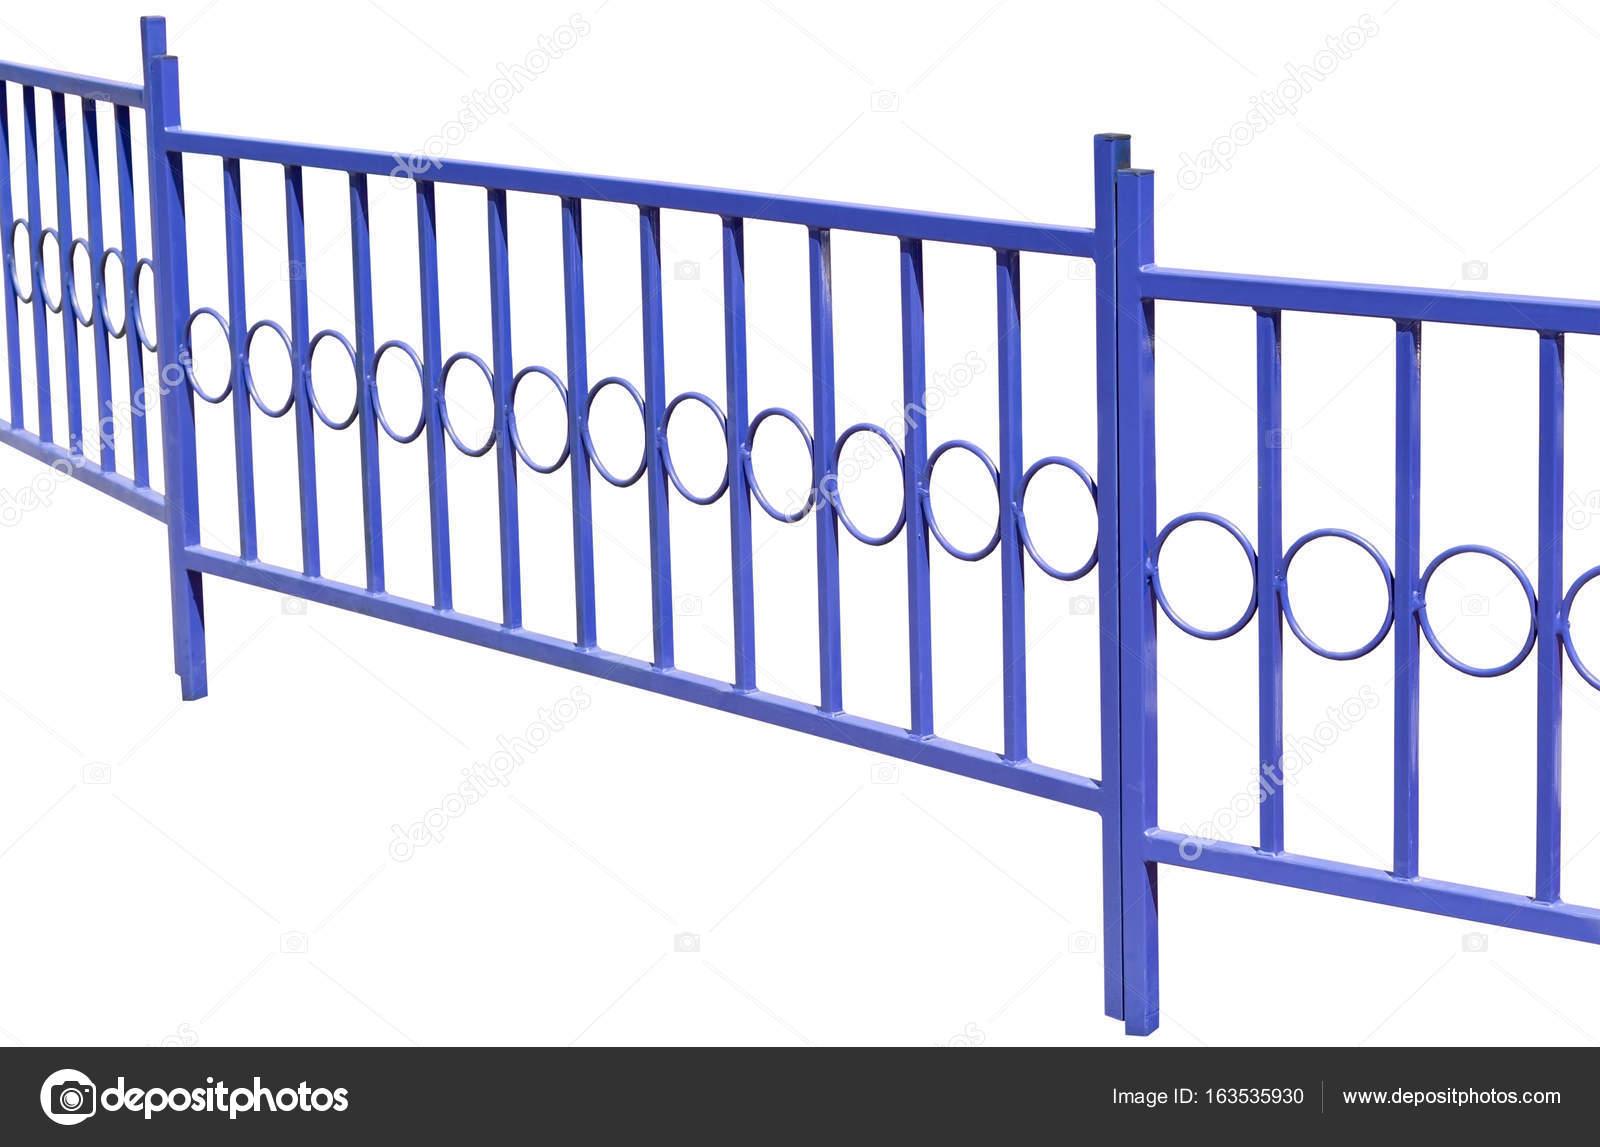 Blaue Metallzaun Auf Weiss Stockfoto C Vega 240 163535930